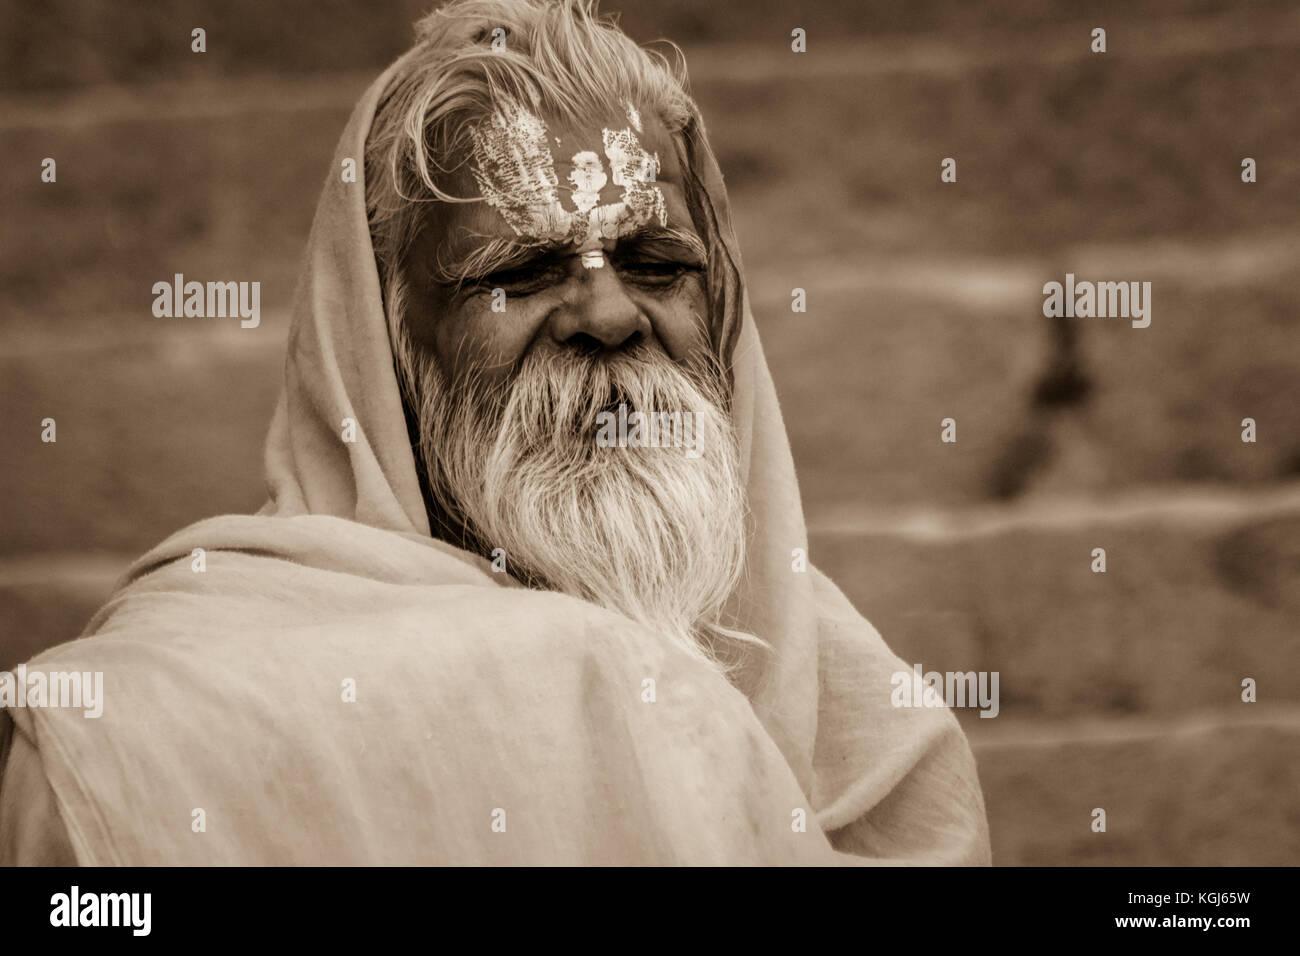 Portrait of a sadhu Baba in Varanasi, Utter Pradesh,India. - Stock Image